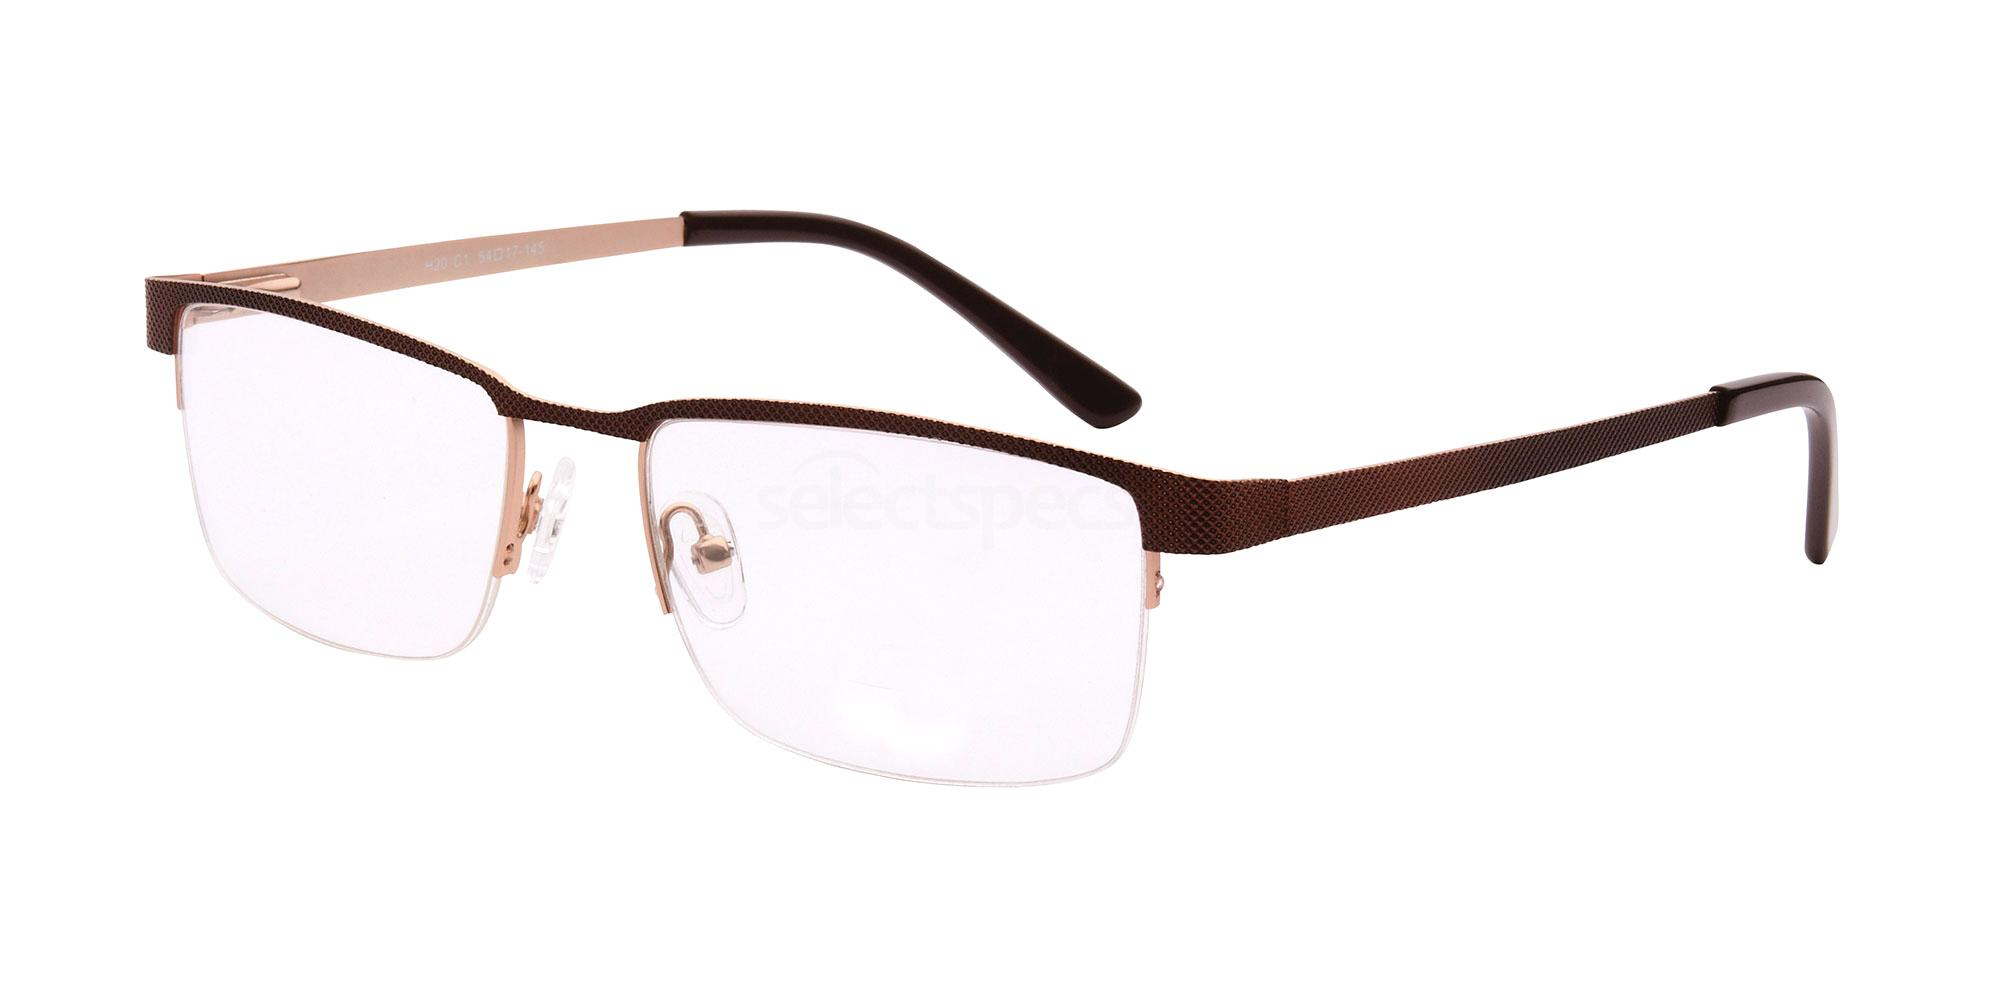 C1 H20 Glasses, Halstrom